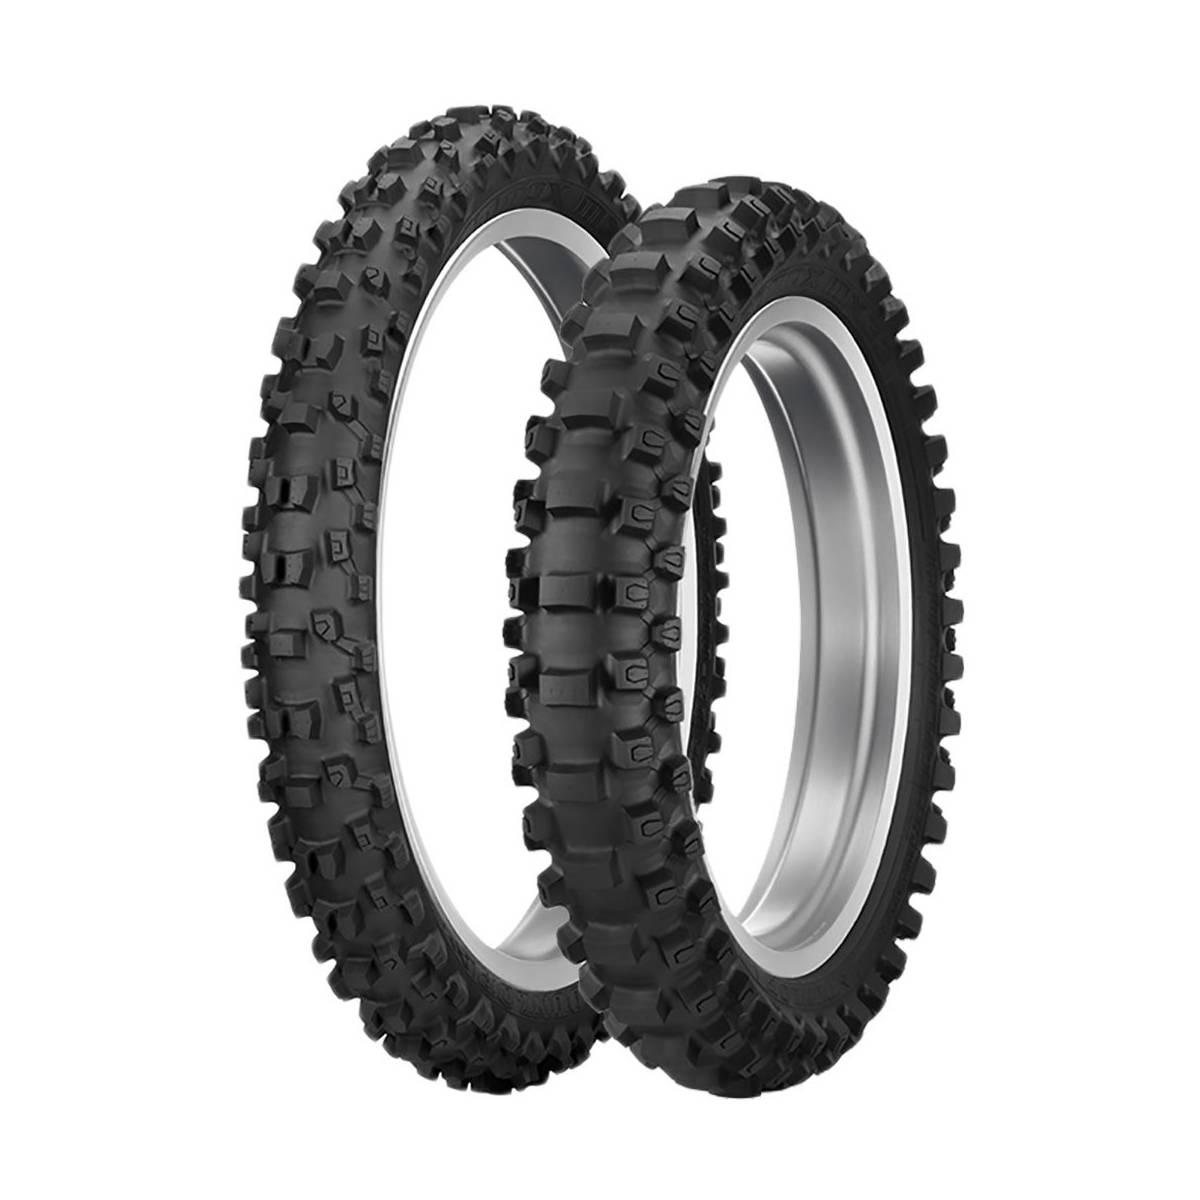 D6010012-MX33 - Neumático Dunlop 60 100-12 Geomax Mx33 F